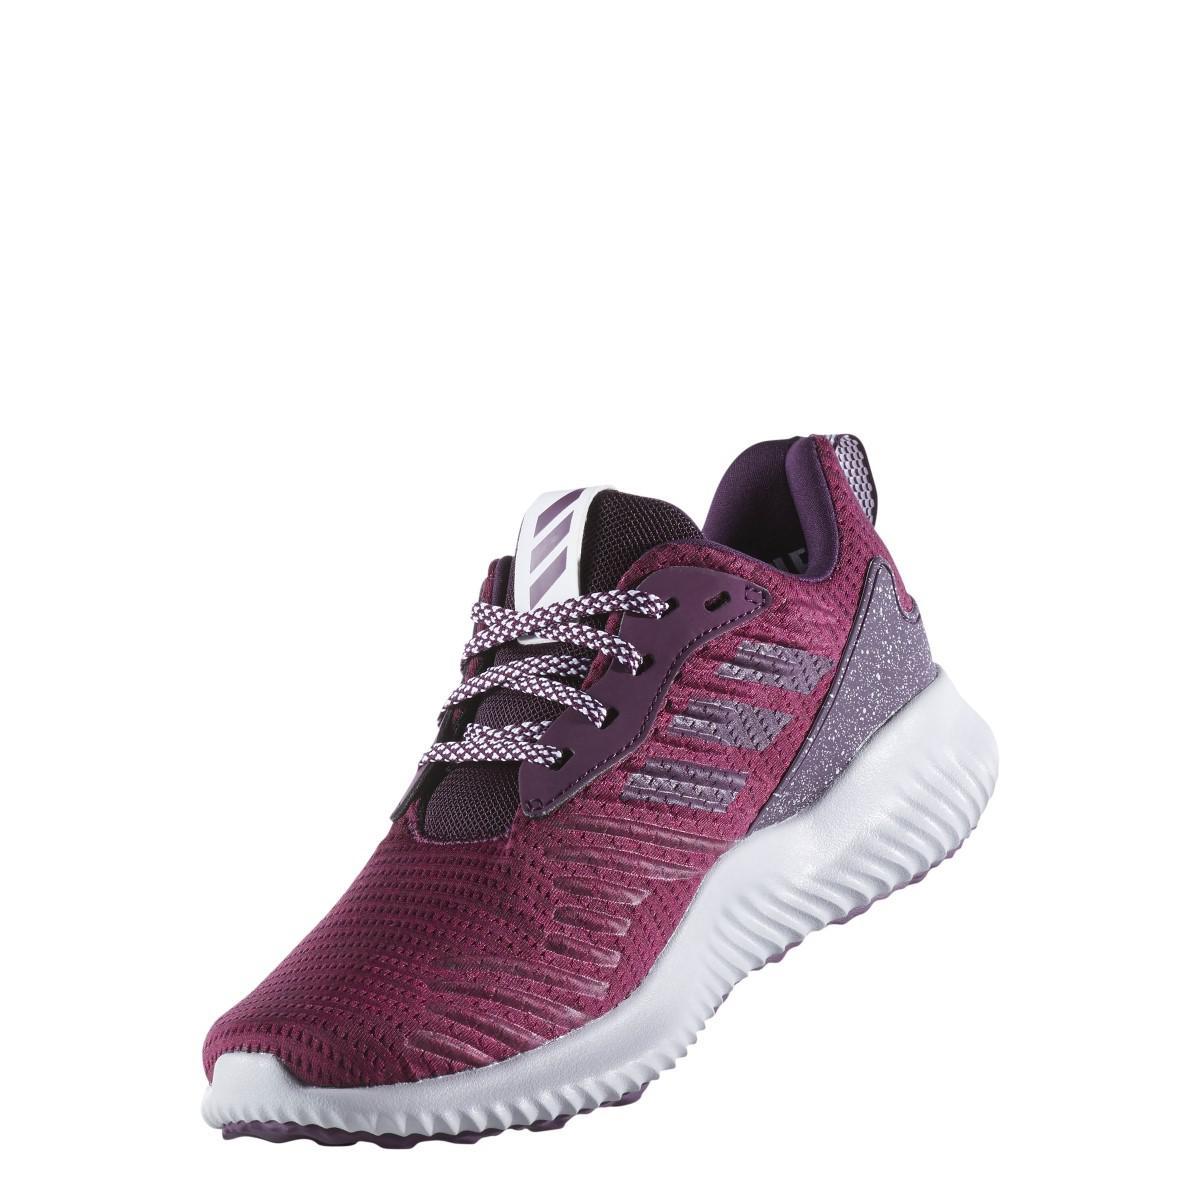 cf9a31a4cef29 Lyst - adidas Alphabounce Rc Red Night mystery Ruby footwear White ...